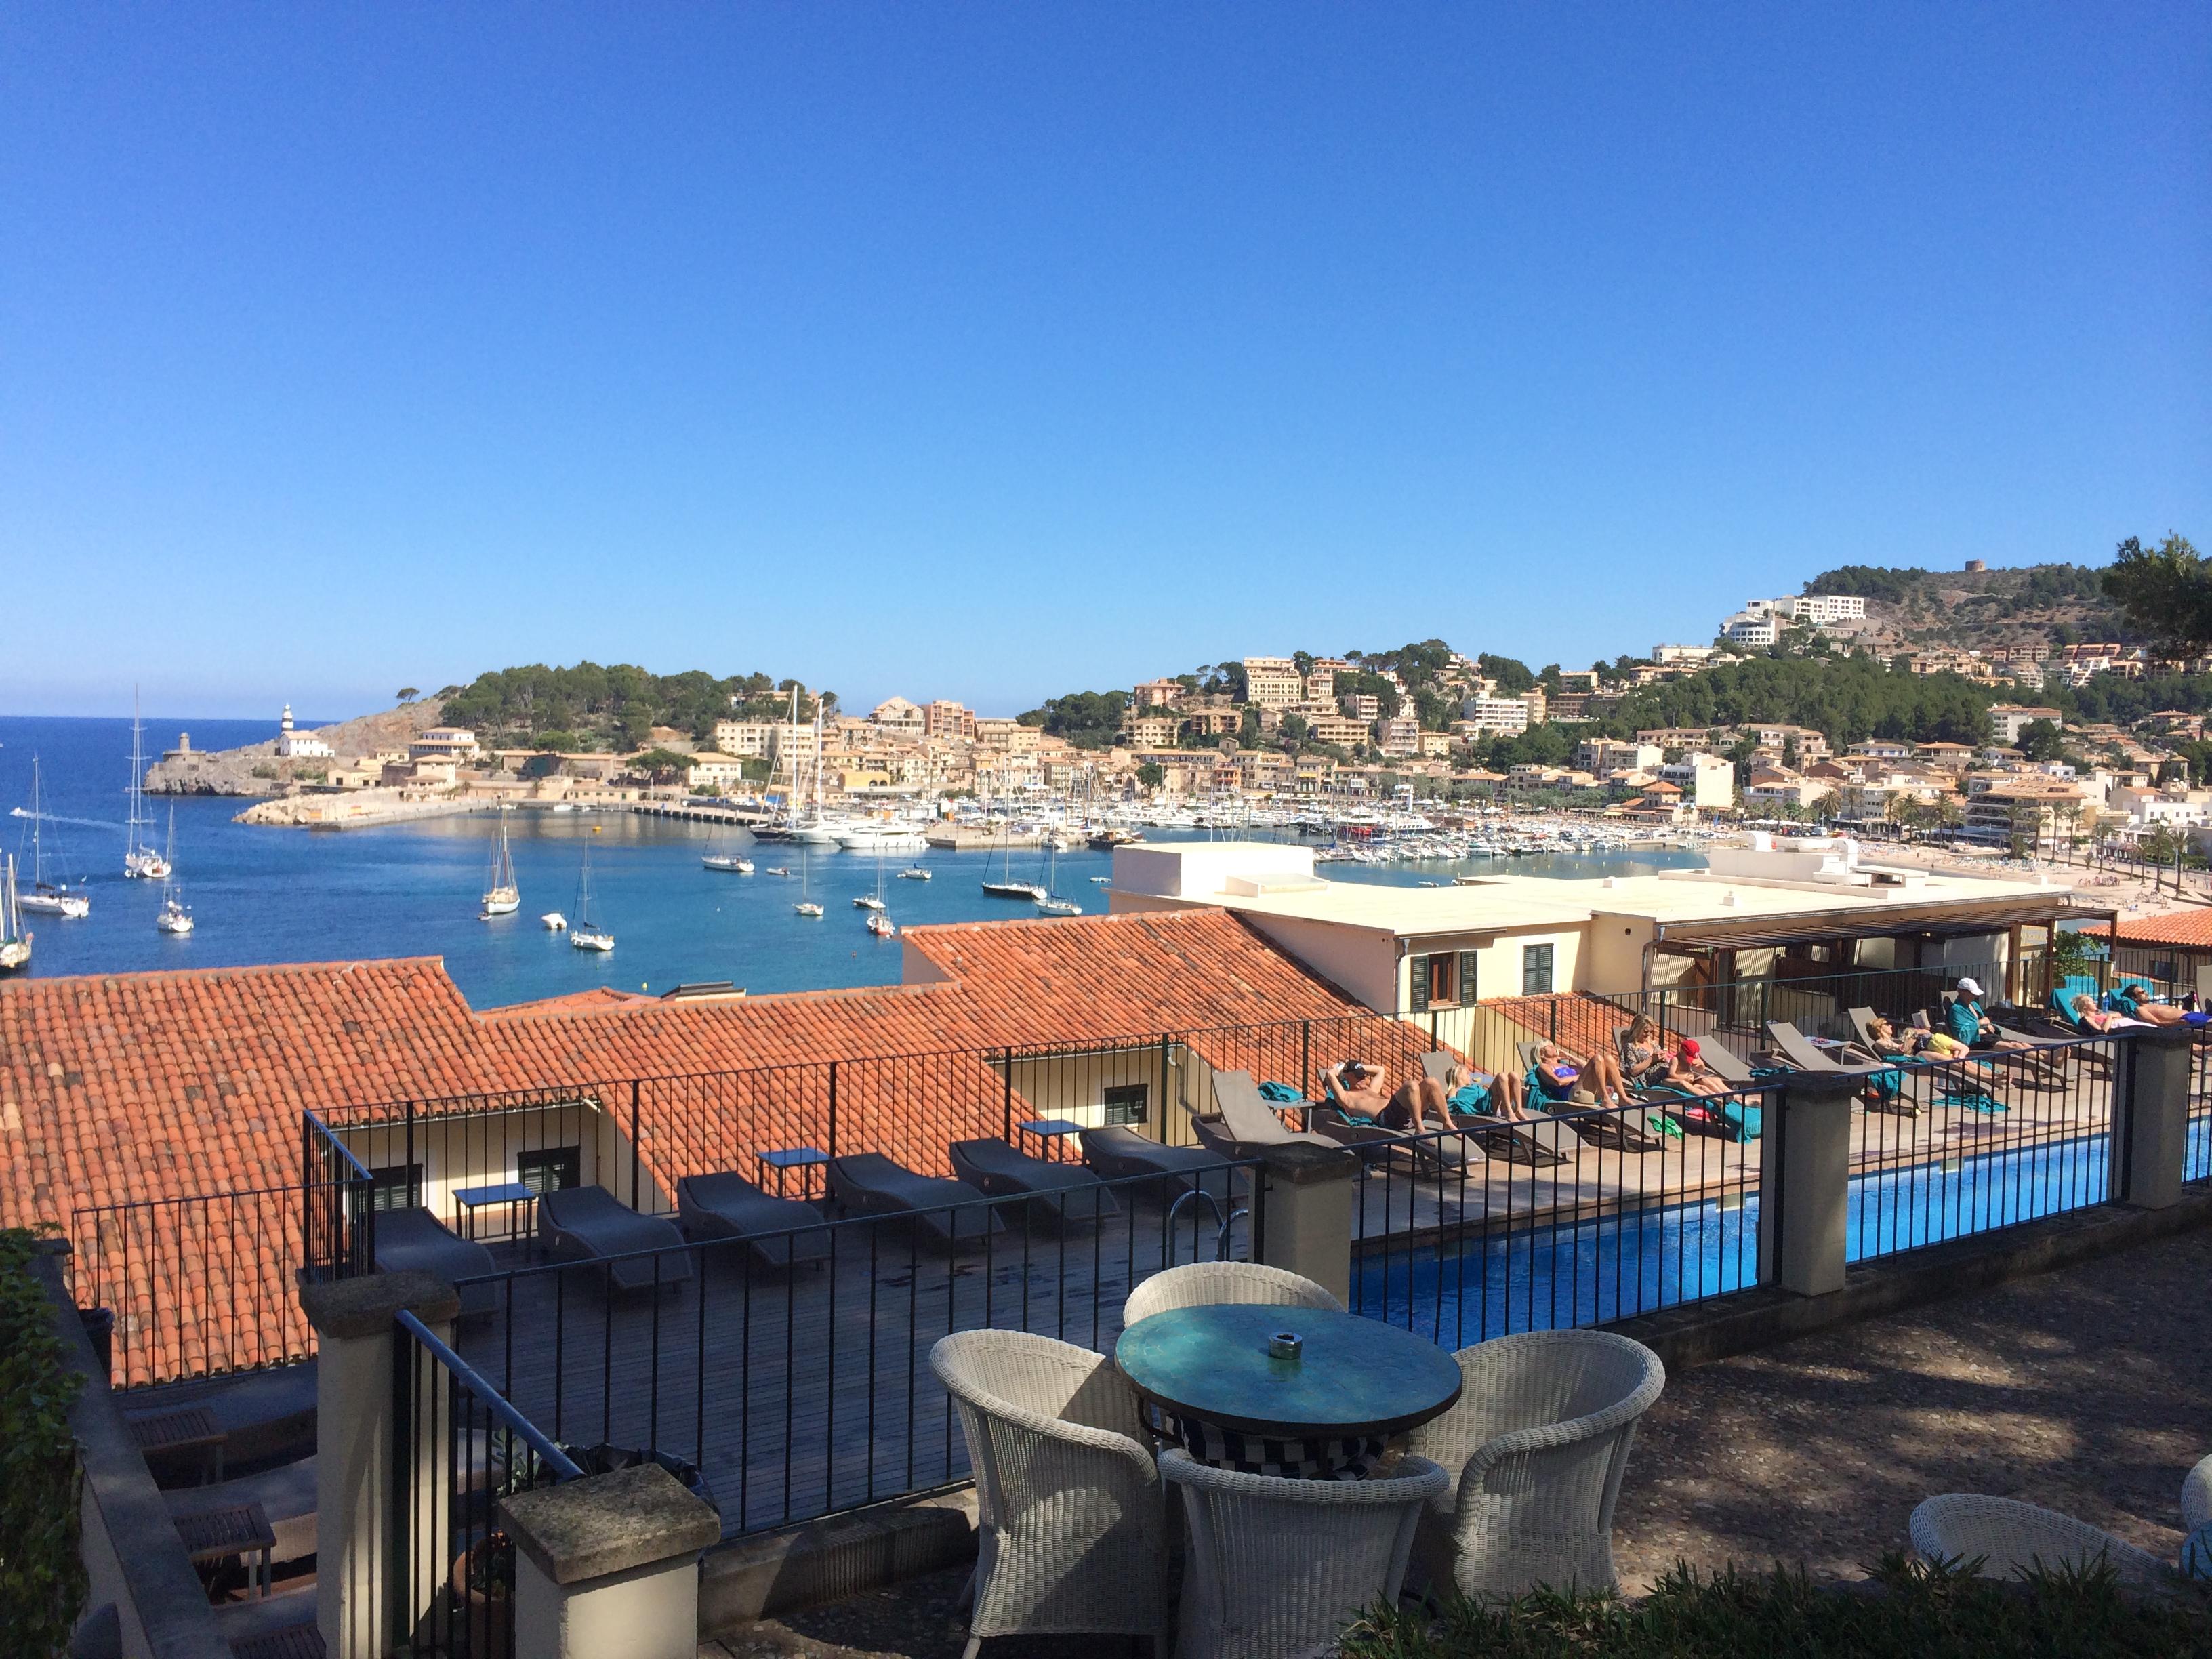 Unser Lieblingshotel In Mallorca Hotel Esplendido In Puerto De